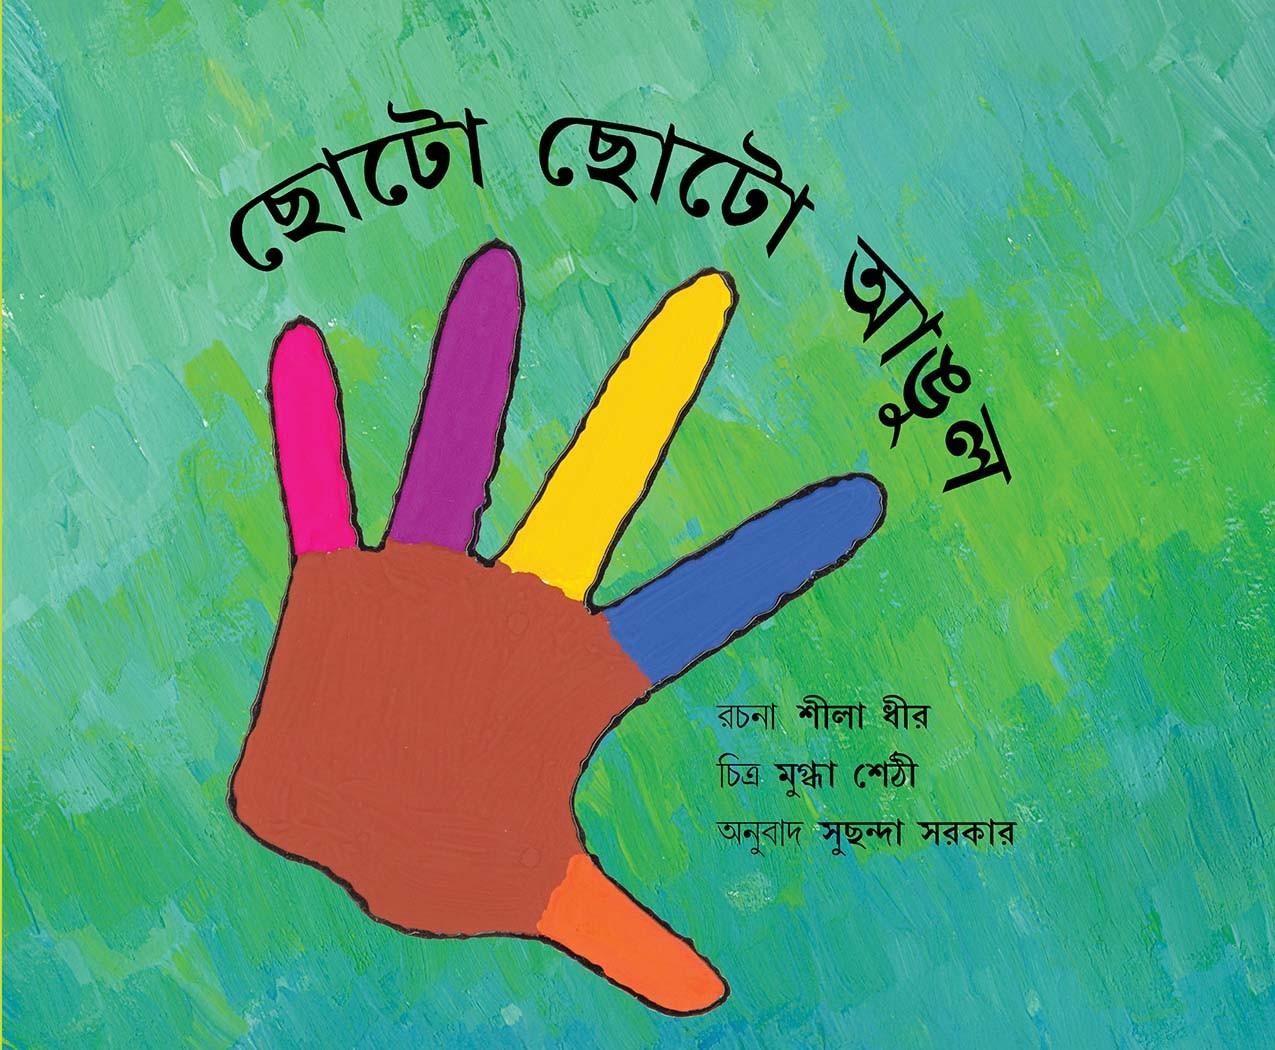 Little Fingers/Chhoto Chhoto Angul (Bengali)